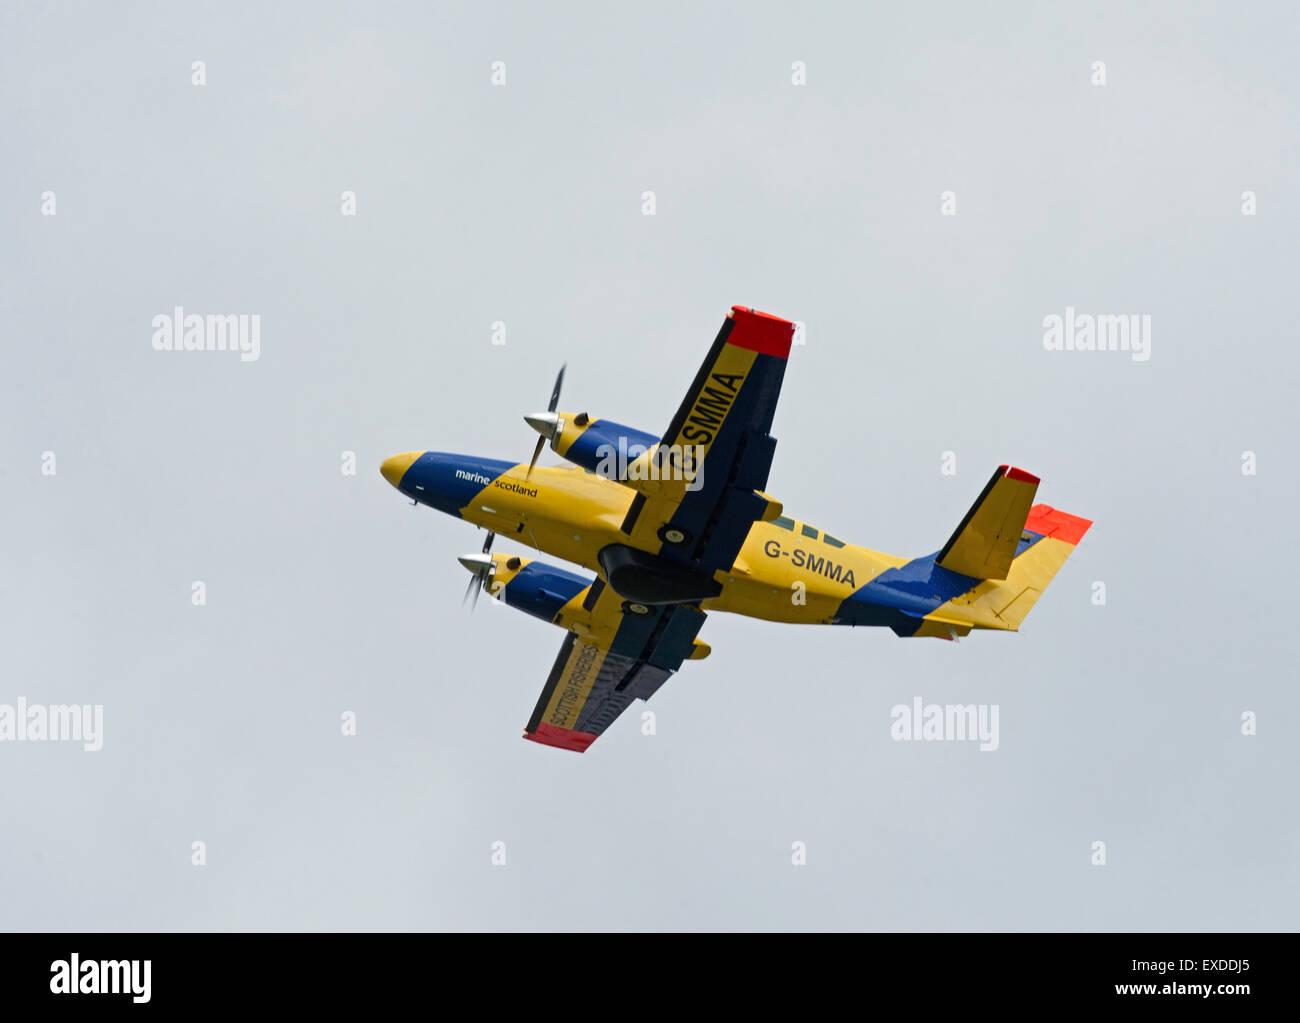 Scottish Fisheries Protection Agency Reims-Cessna F406 Caravan II.  SCO 9933 - Stock Image